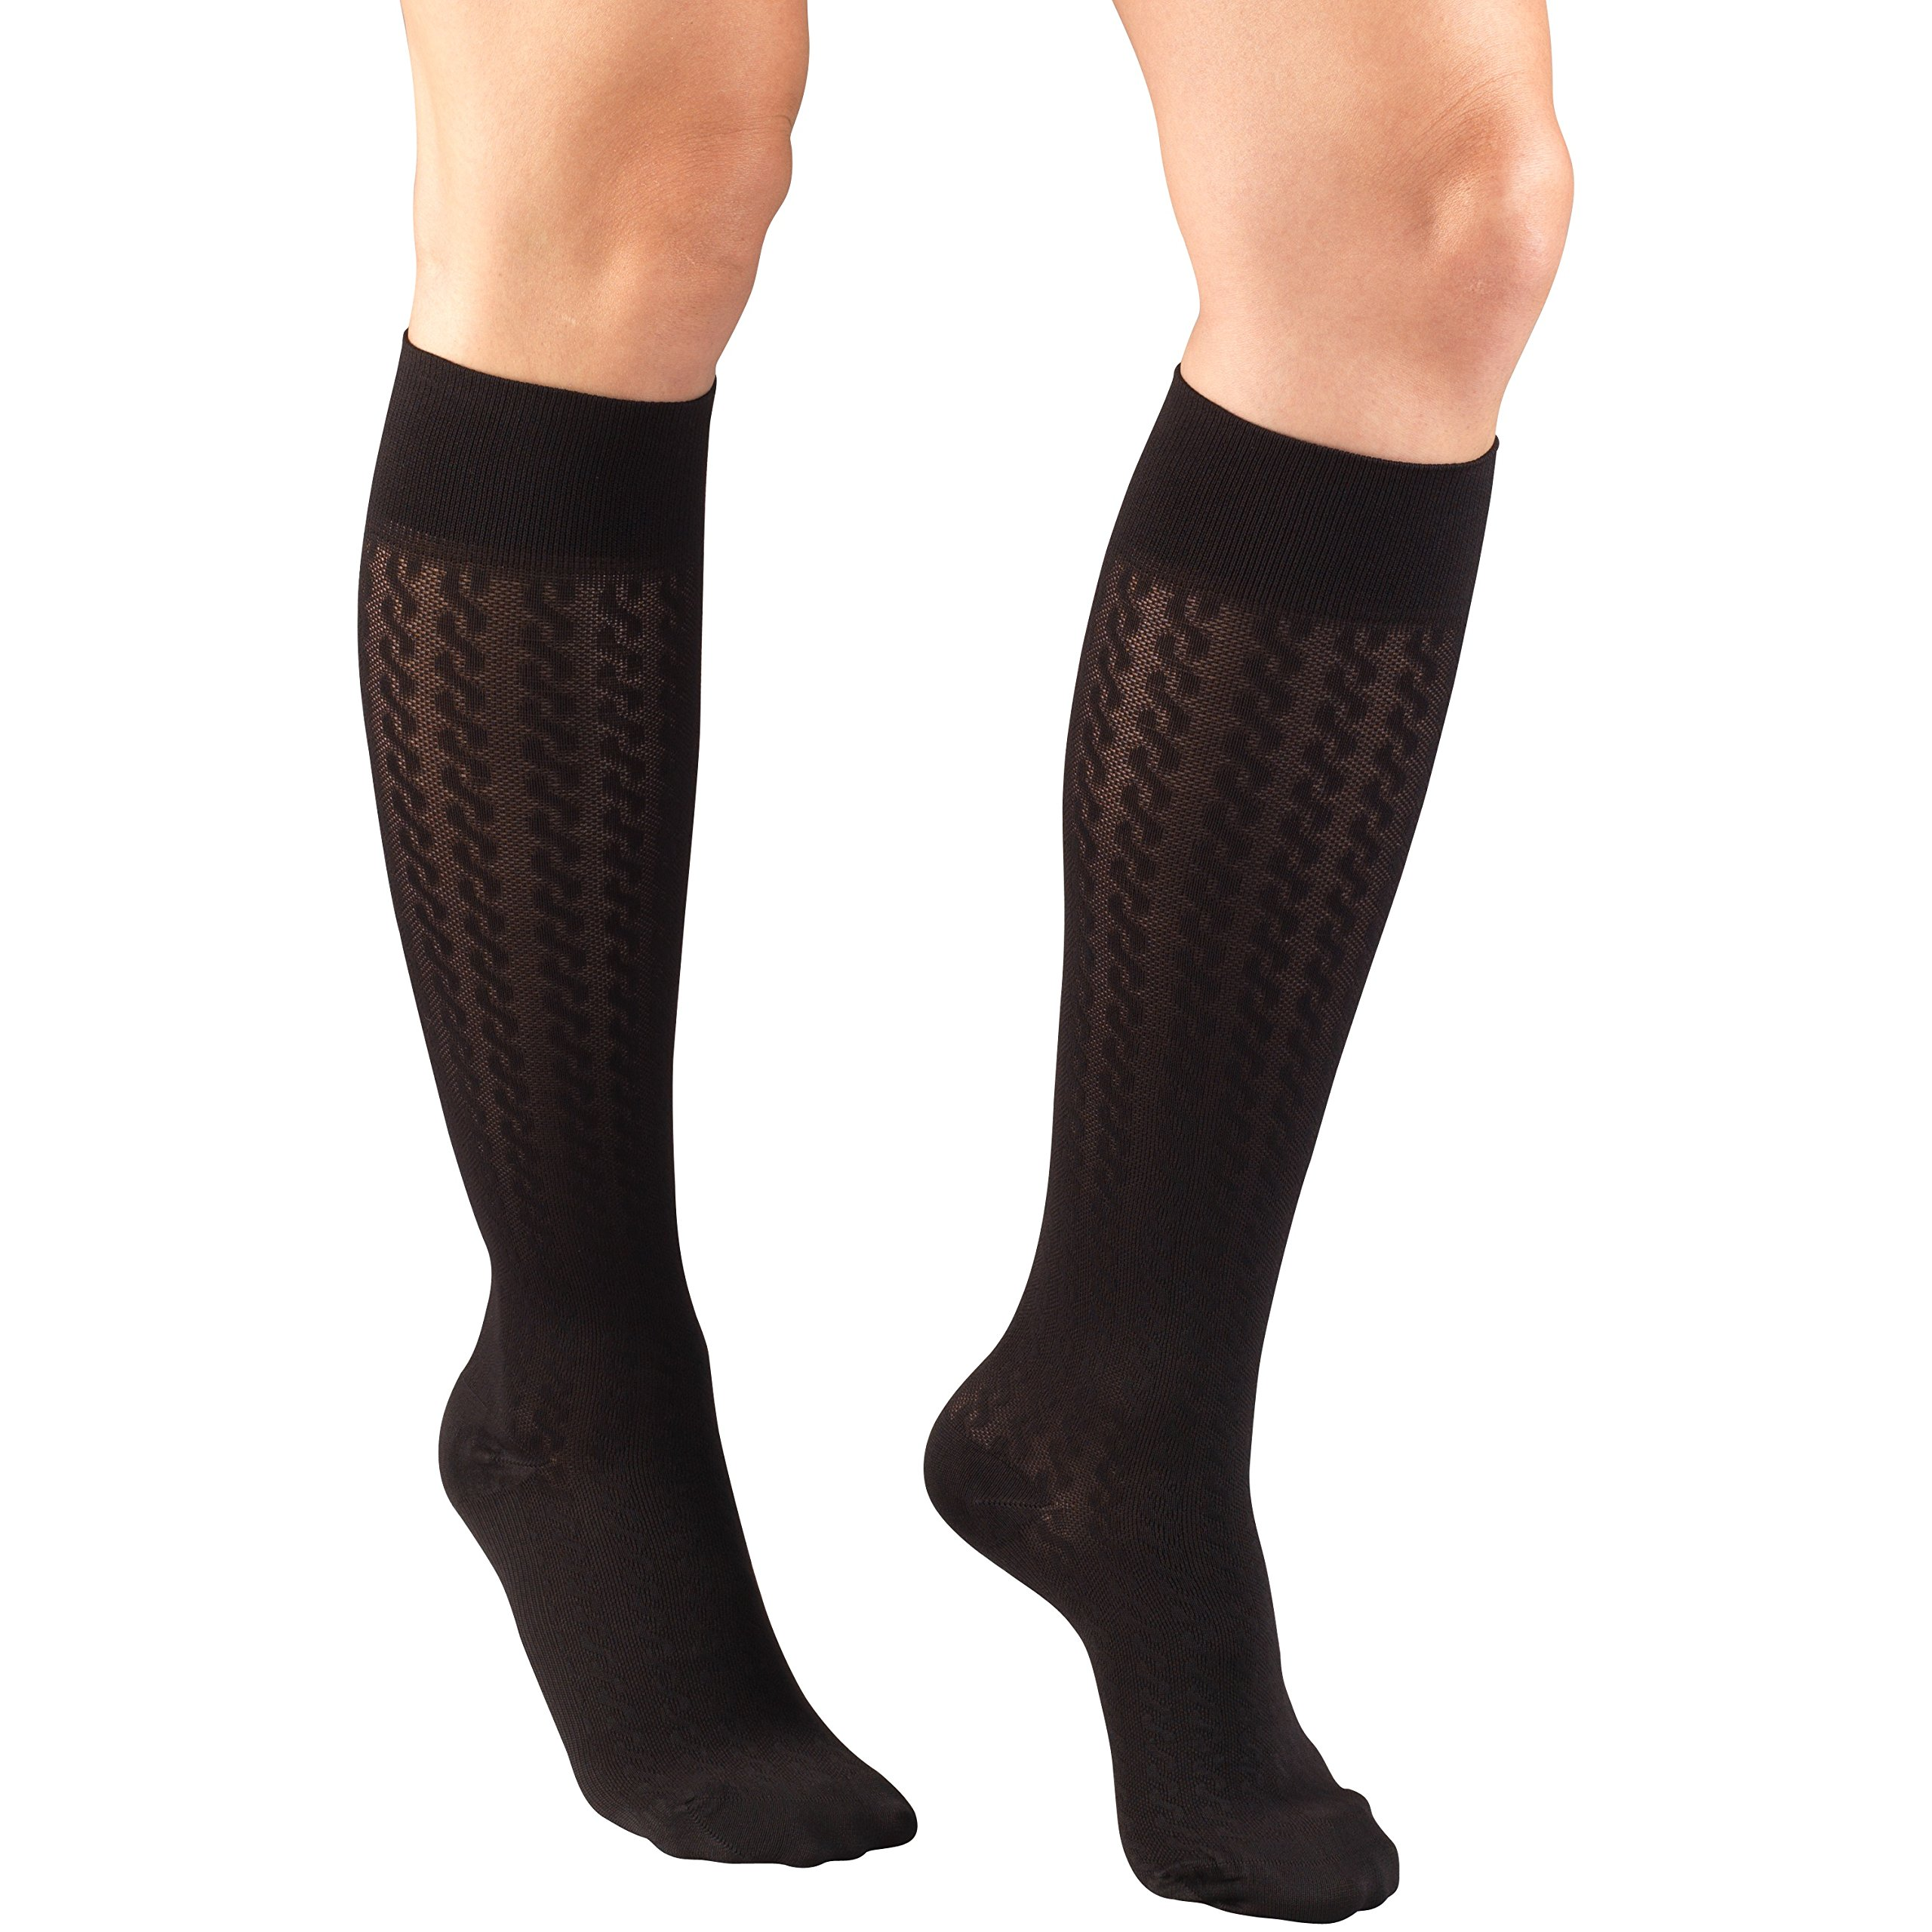 Truform Compression Socks for Women, 15-20 mmHg, Black Cable Pattern, Medium